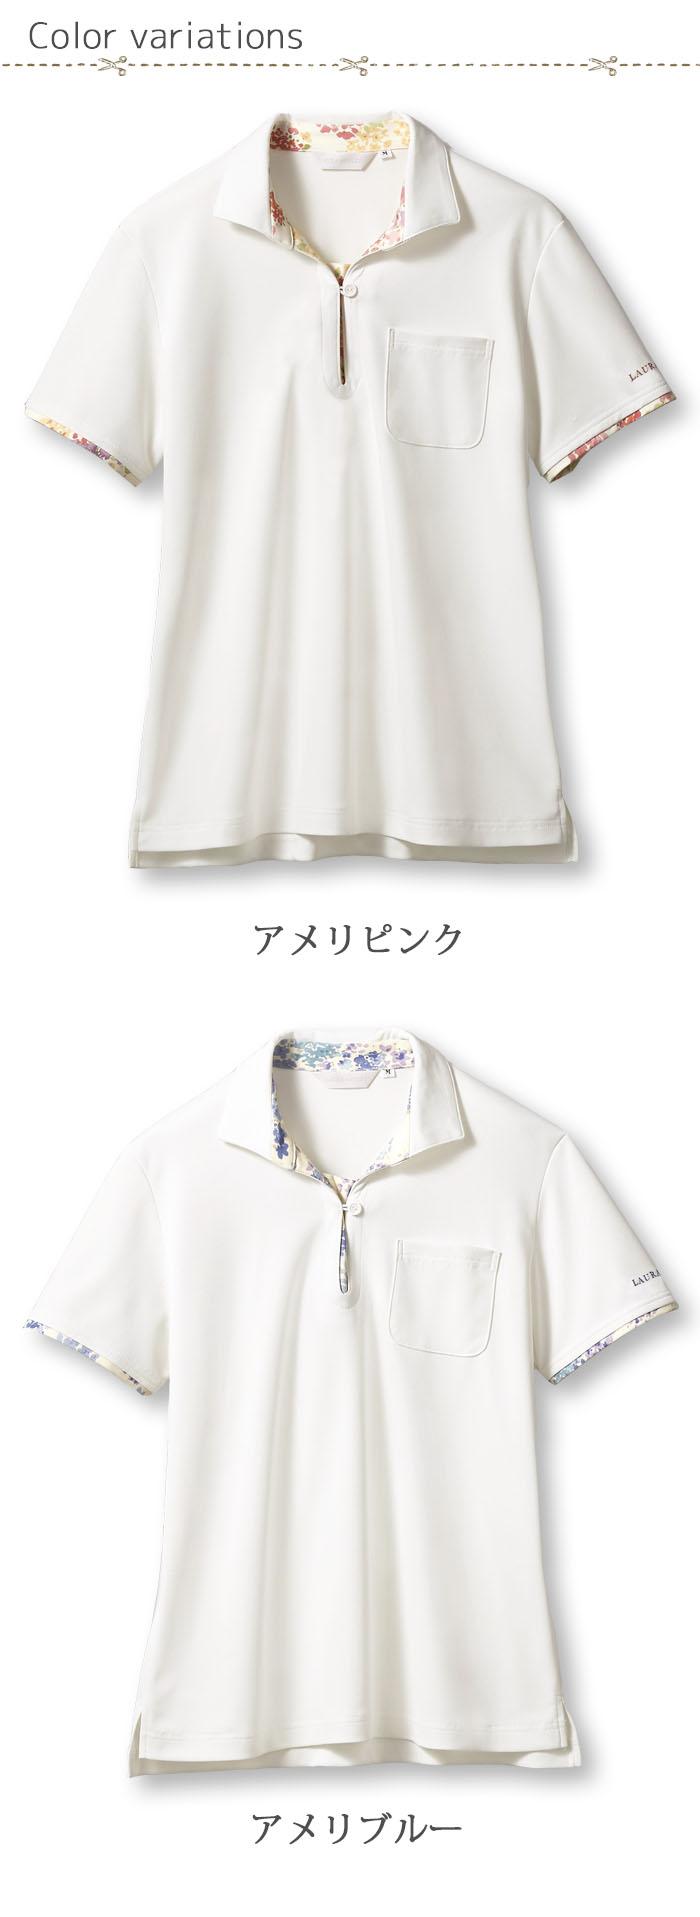 LW203 ニットシャツ カラー画像